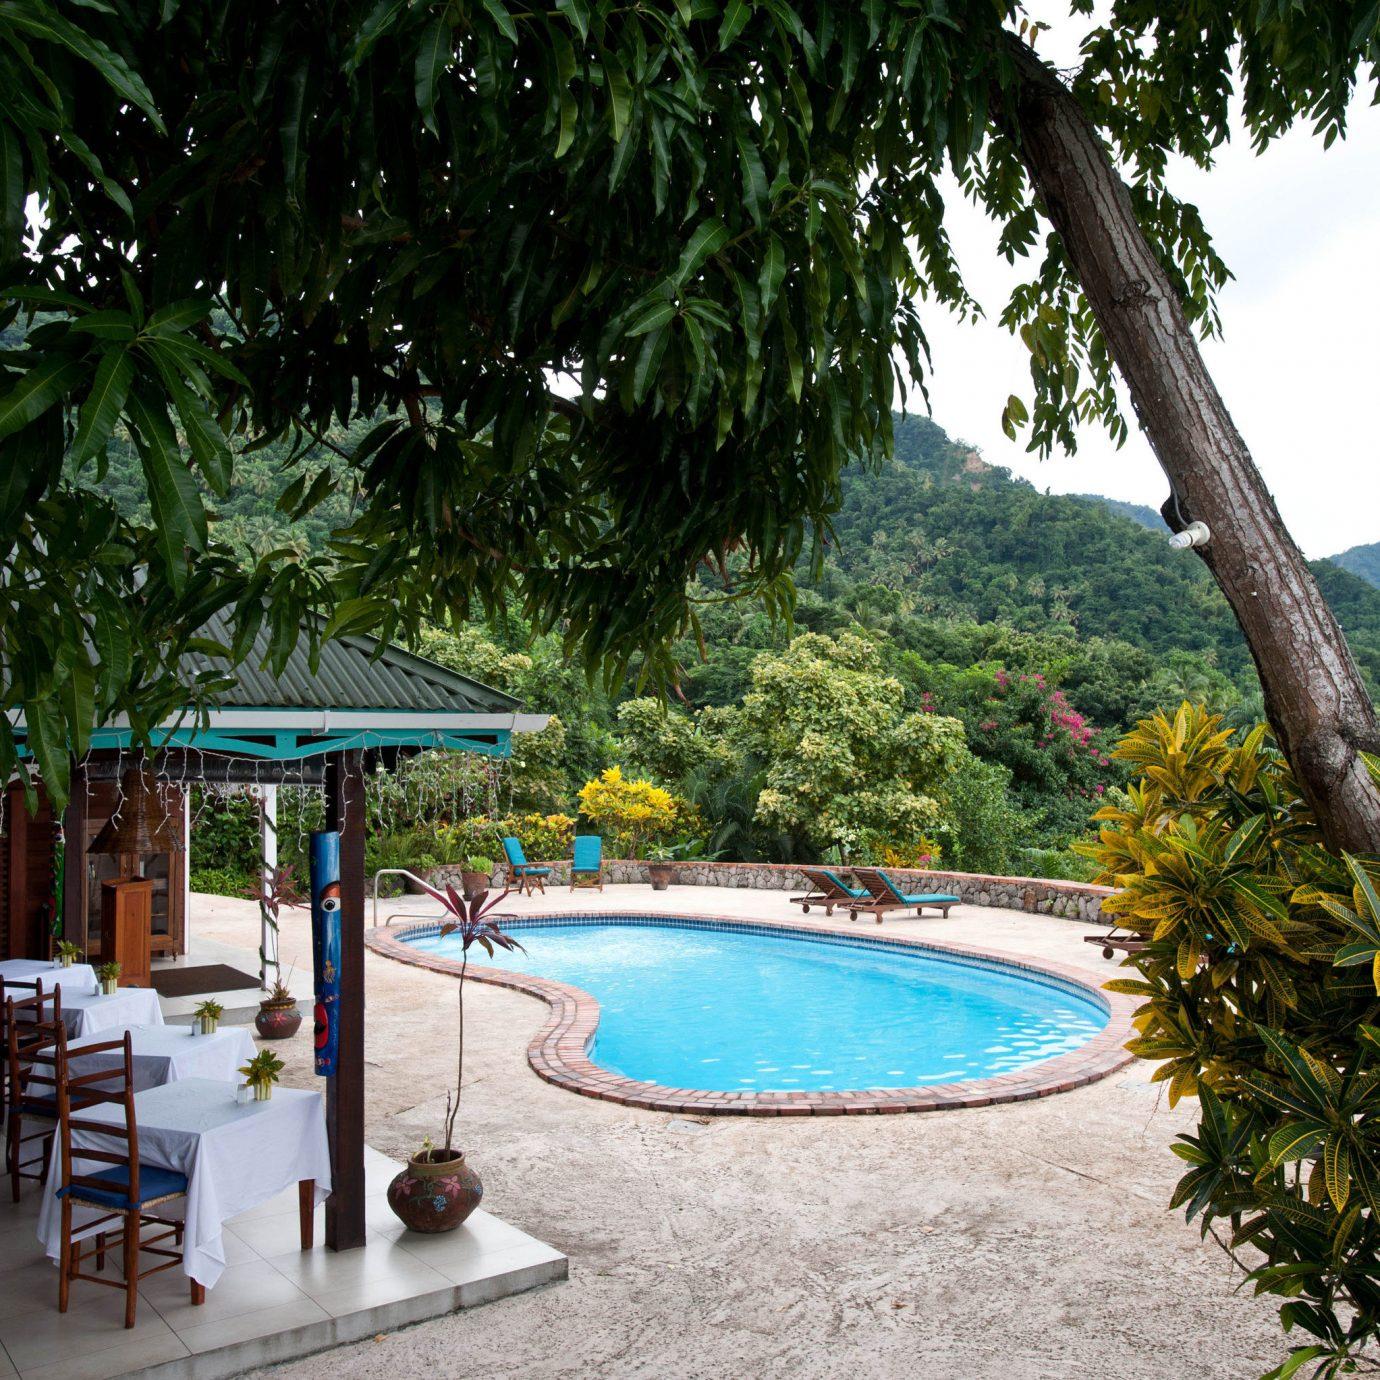 tree leisure swimming pool Resort palm backyard tropics Villa Pool Jungle lined plant shade